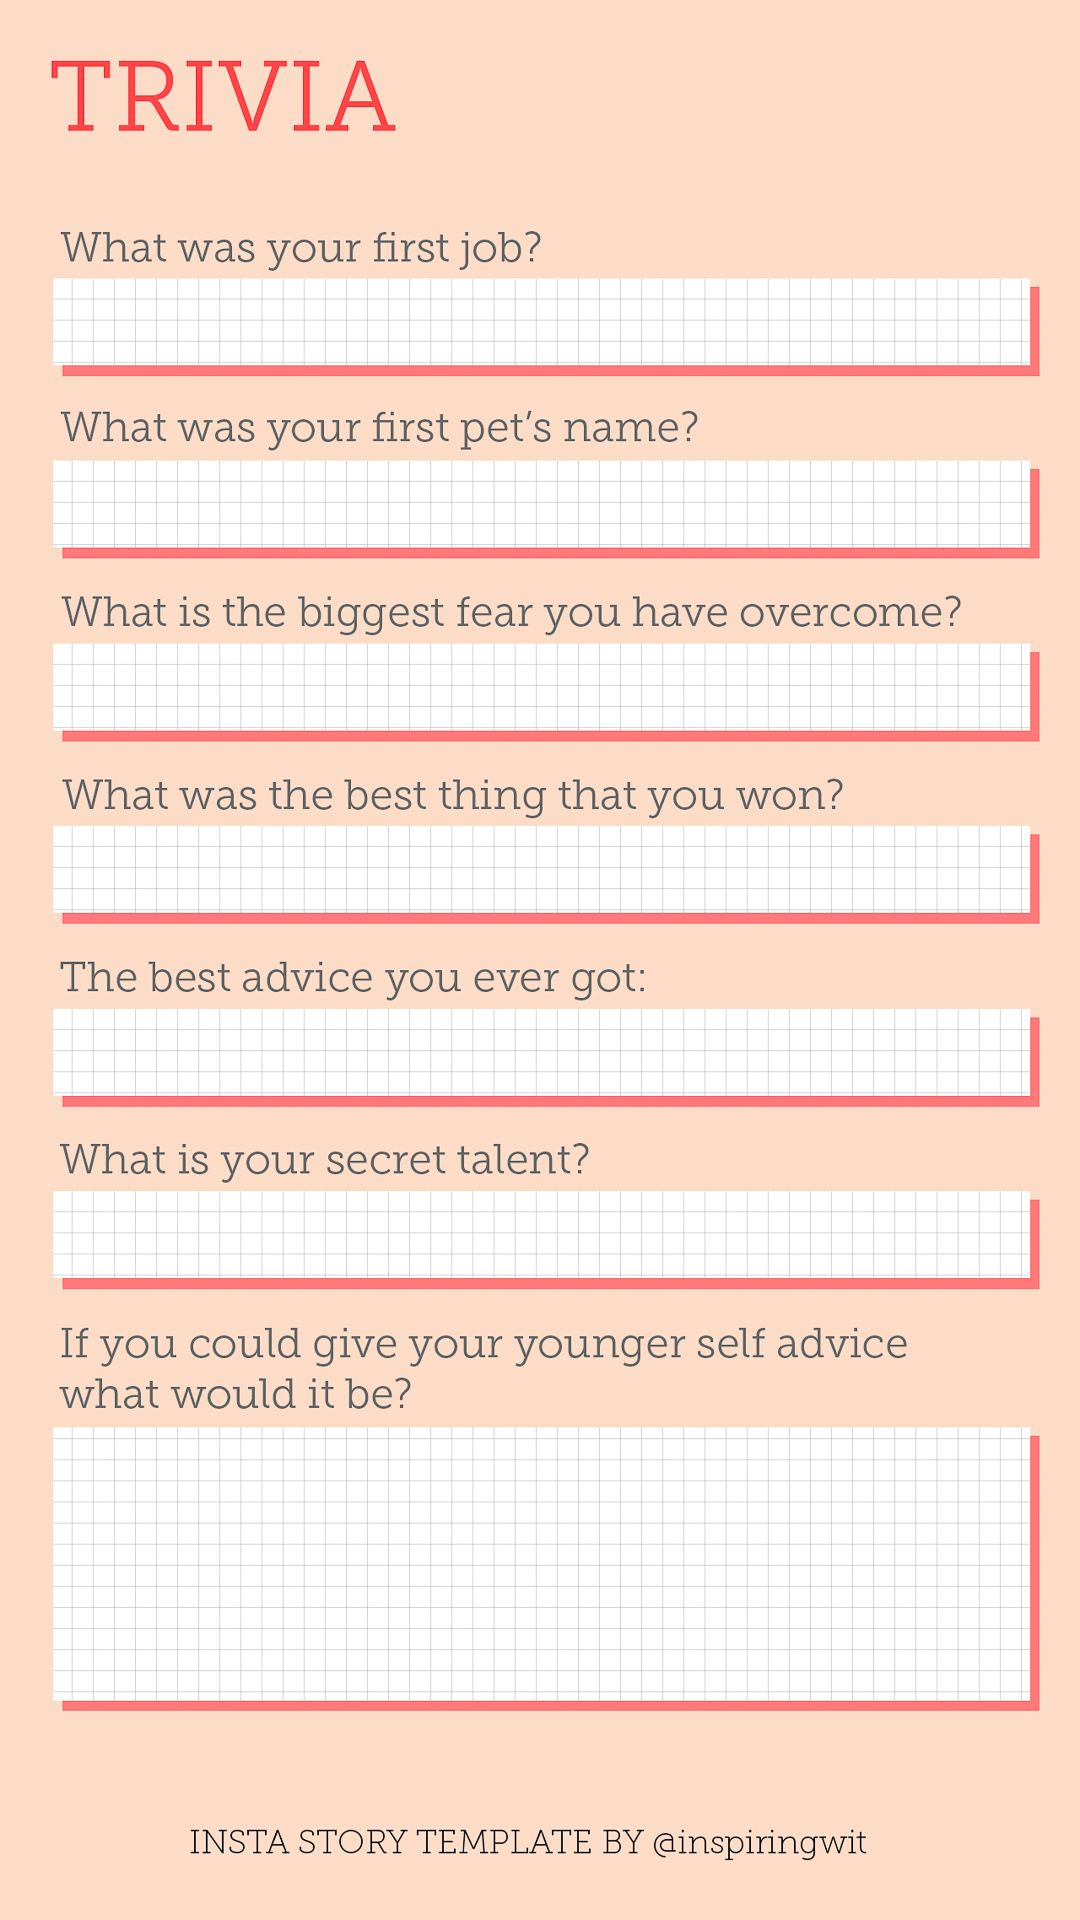 Snapchat trivia